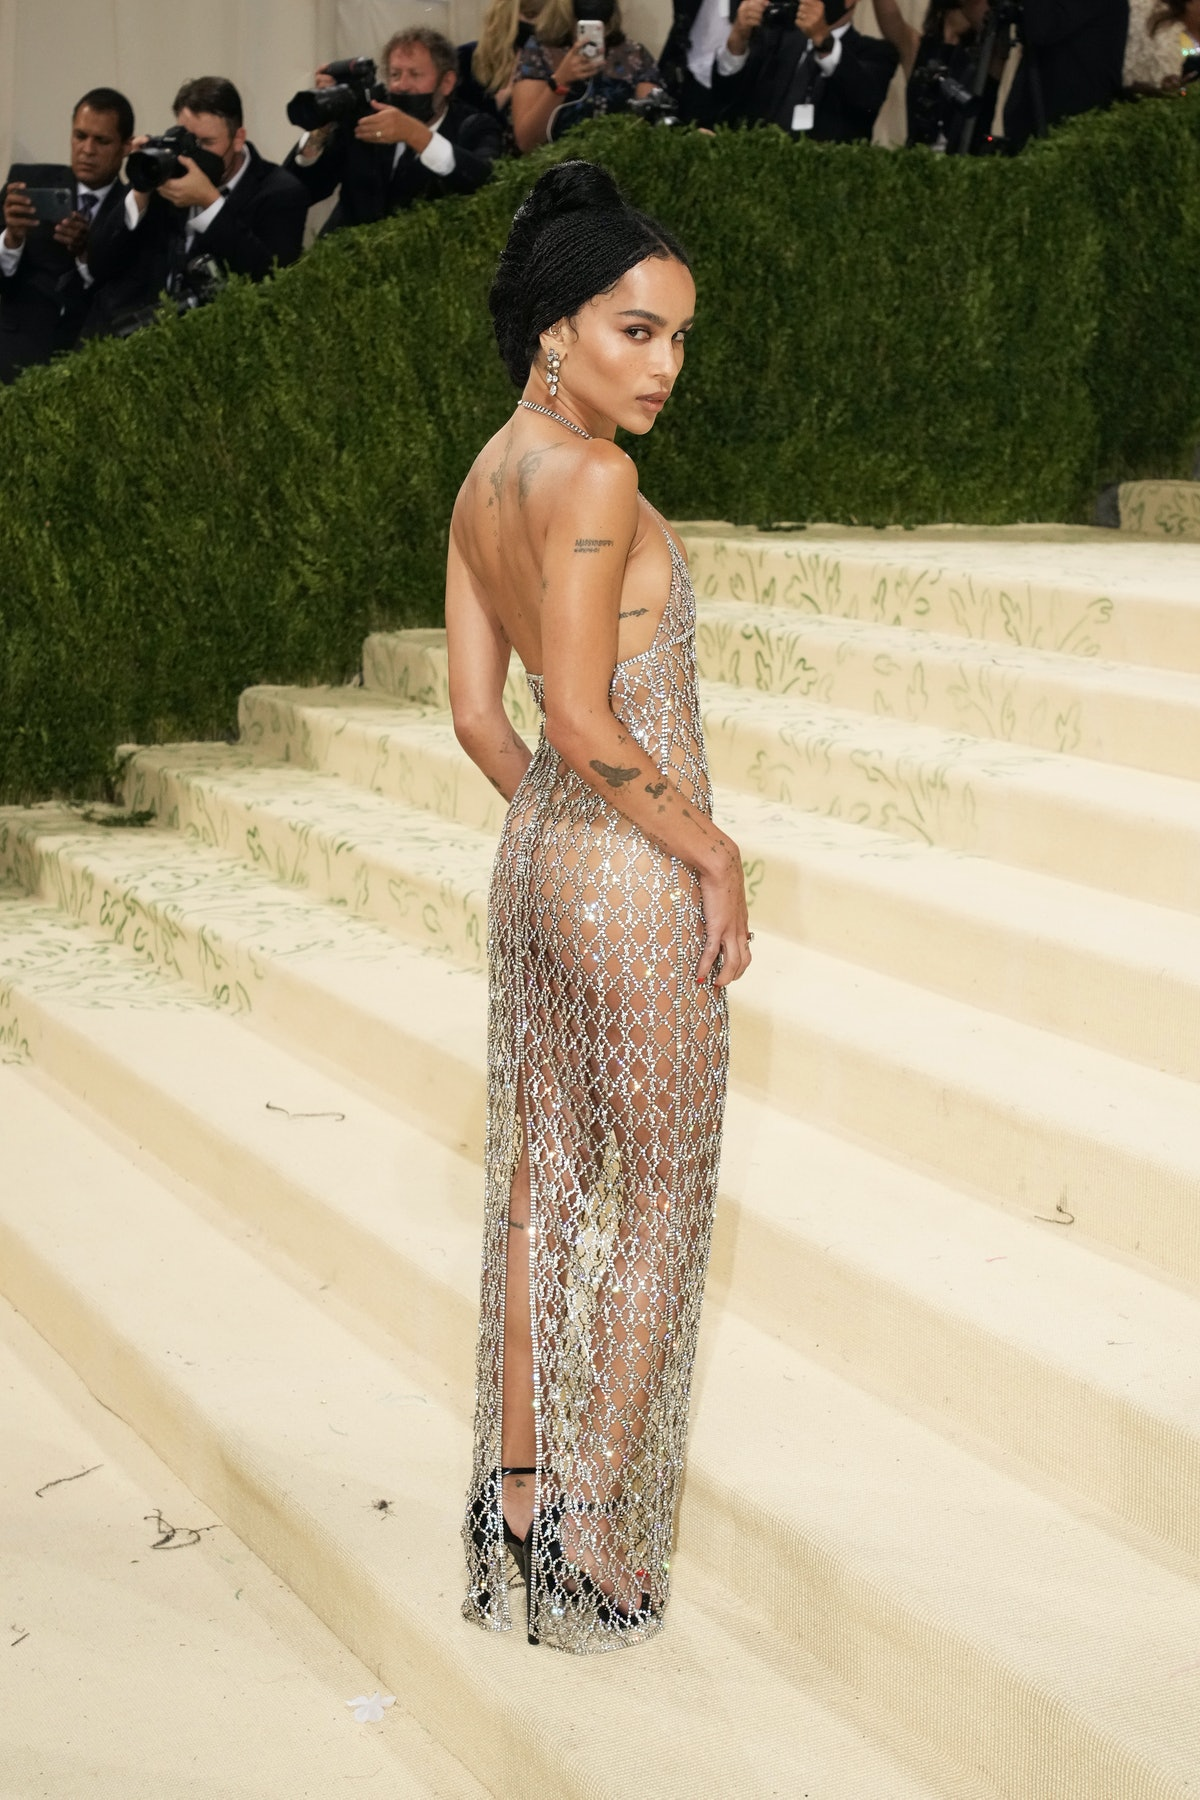 Zoe Kravitz attends The 2021 Met Gala Celebrating In America: A Lexicon Of Fashion at Metropolitan M...